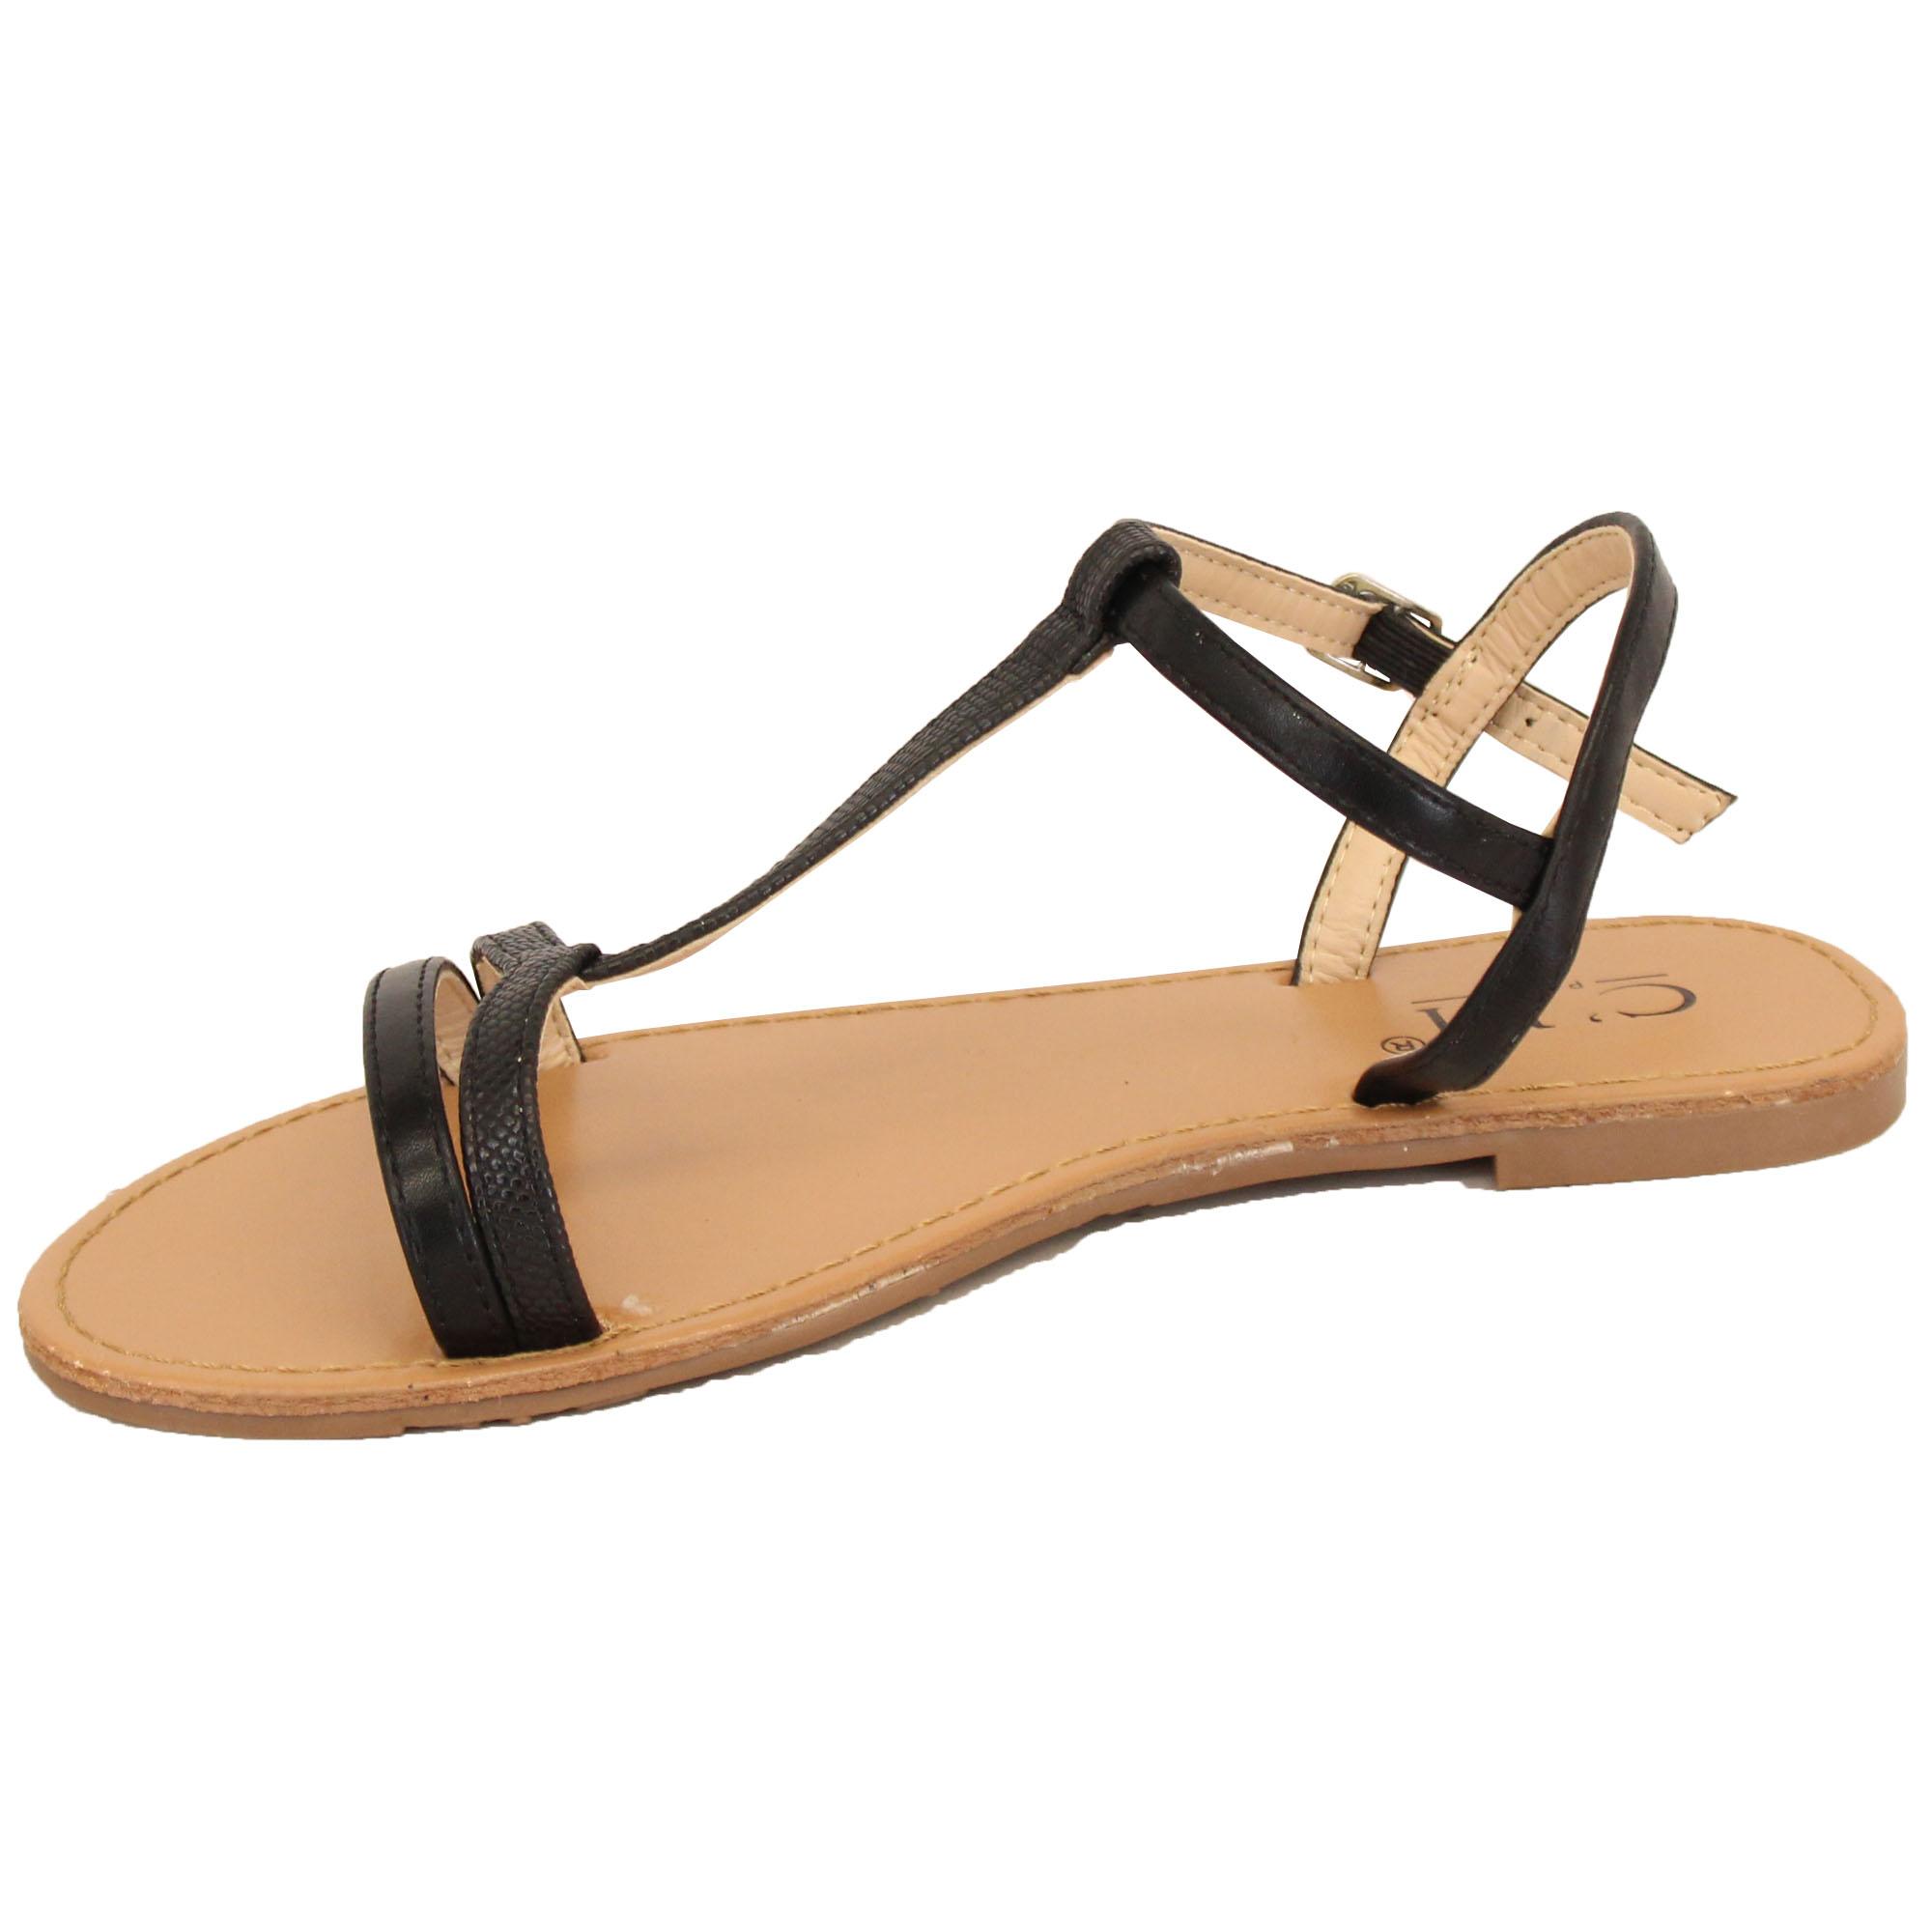 0342e6dcddad Ladies Flat Sandals Womens Open Toe Buckle Strap Shoes Summer ...